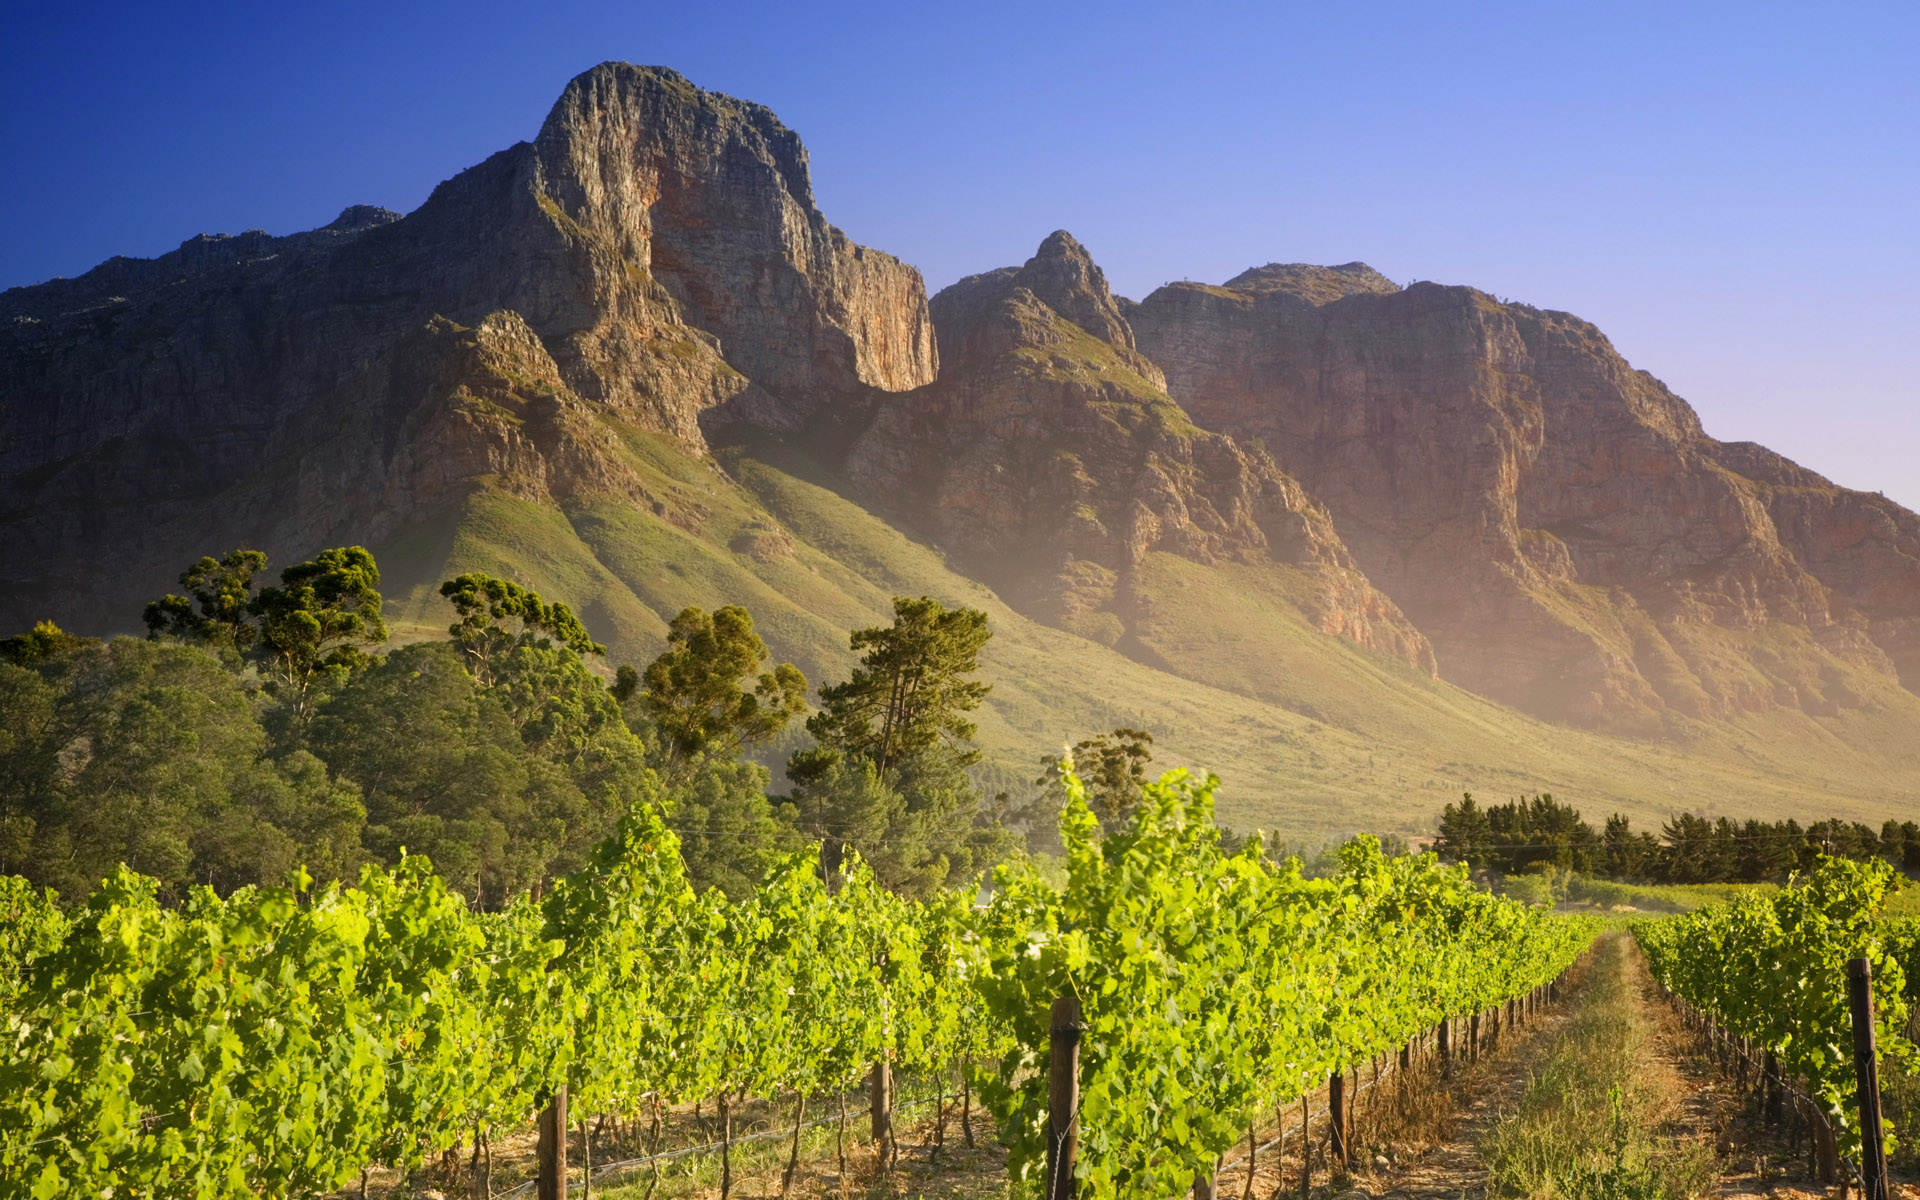 Vineyard in Franschhoek South Africa   Wallpaper 434 1920x1200